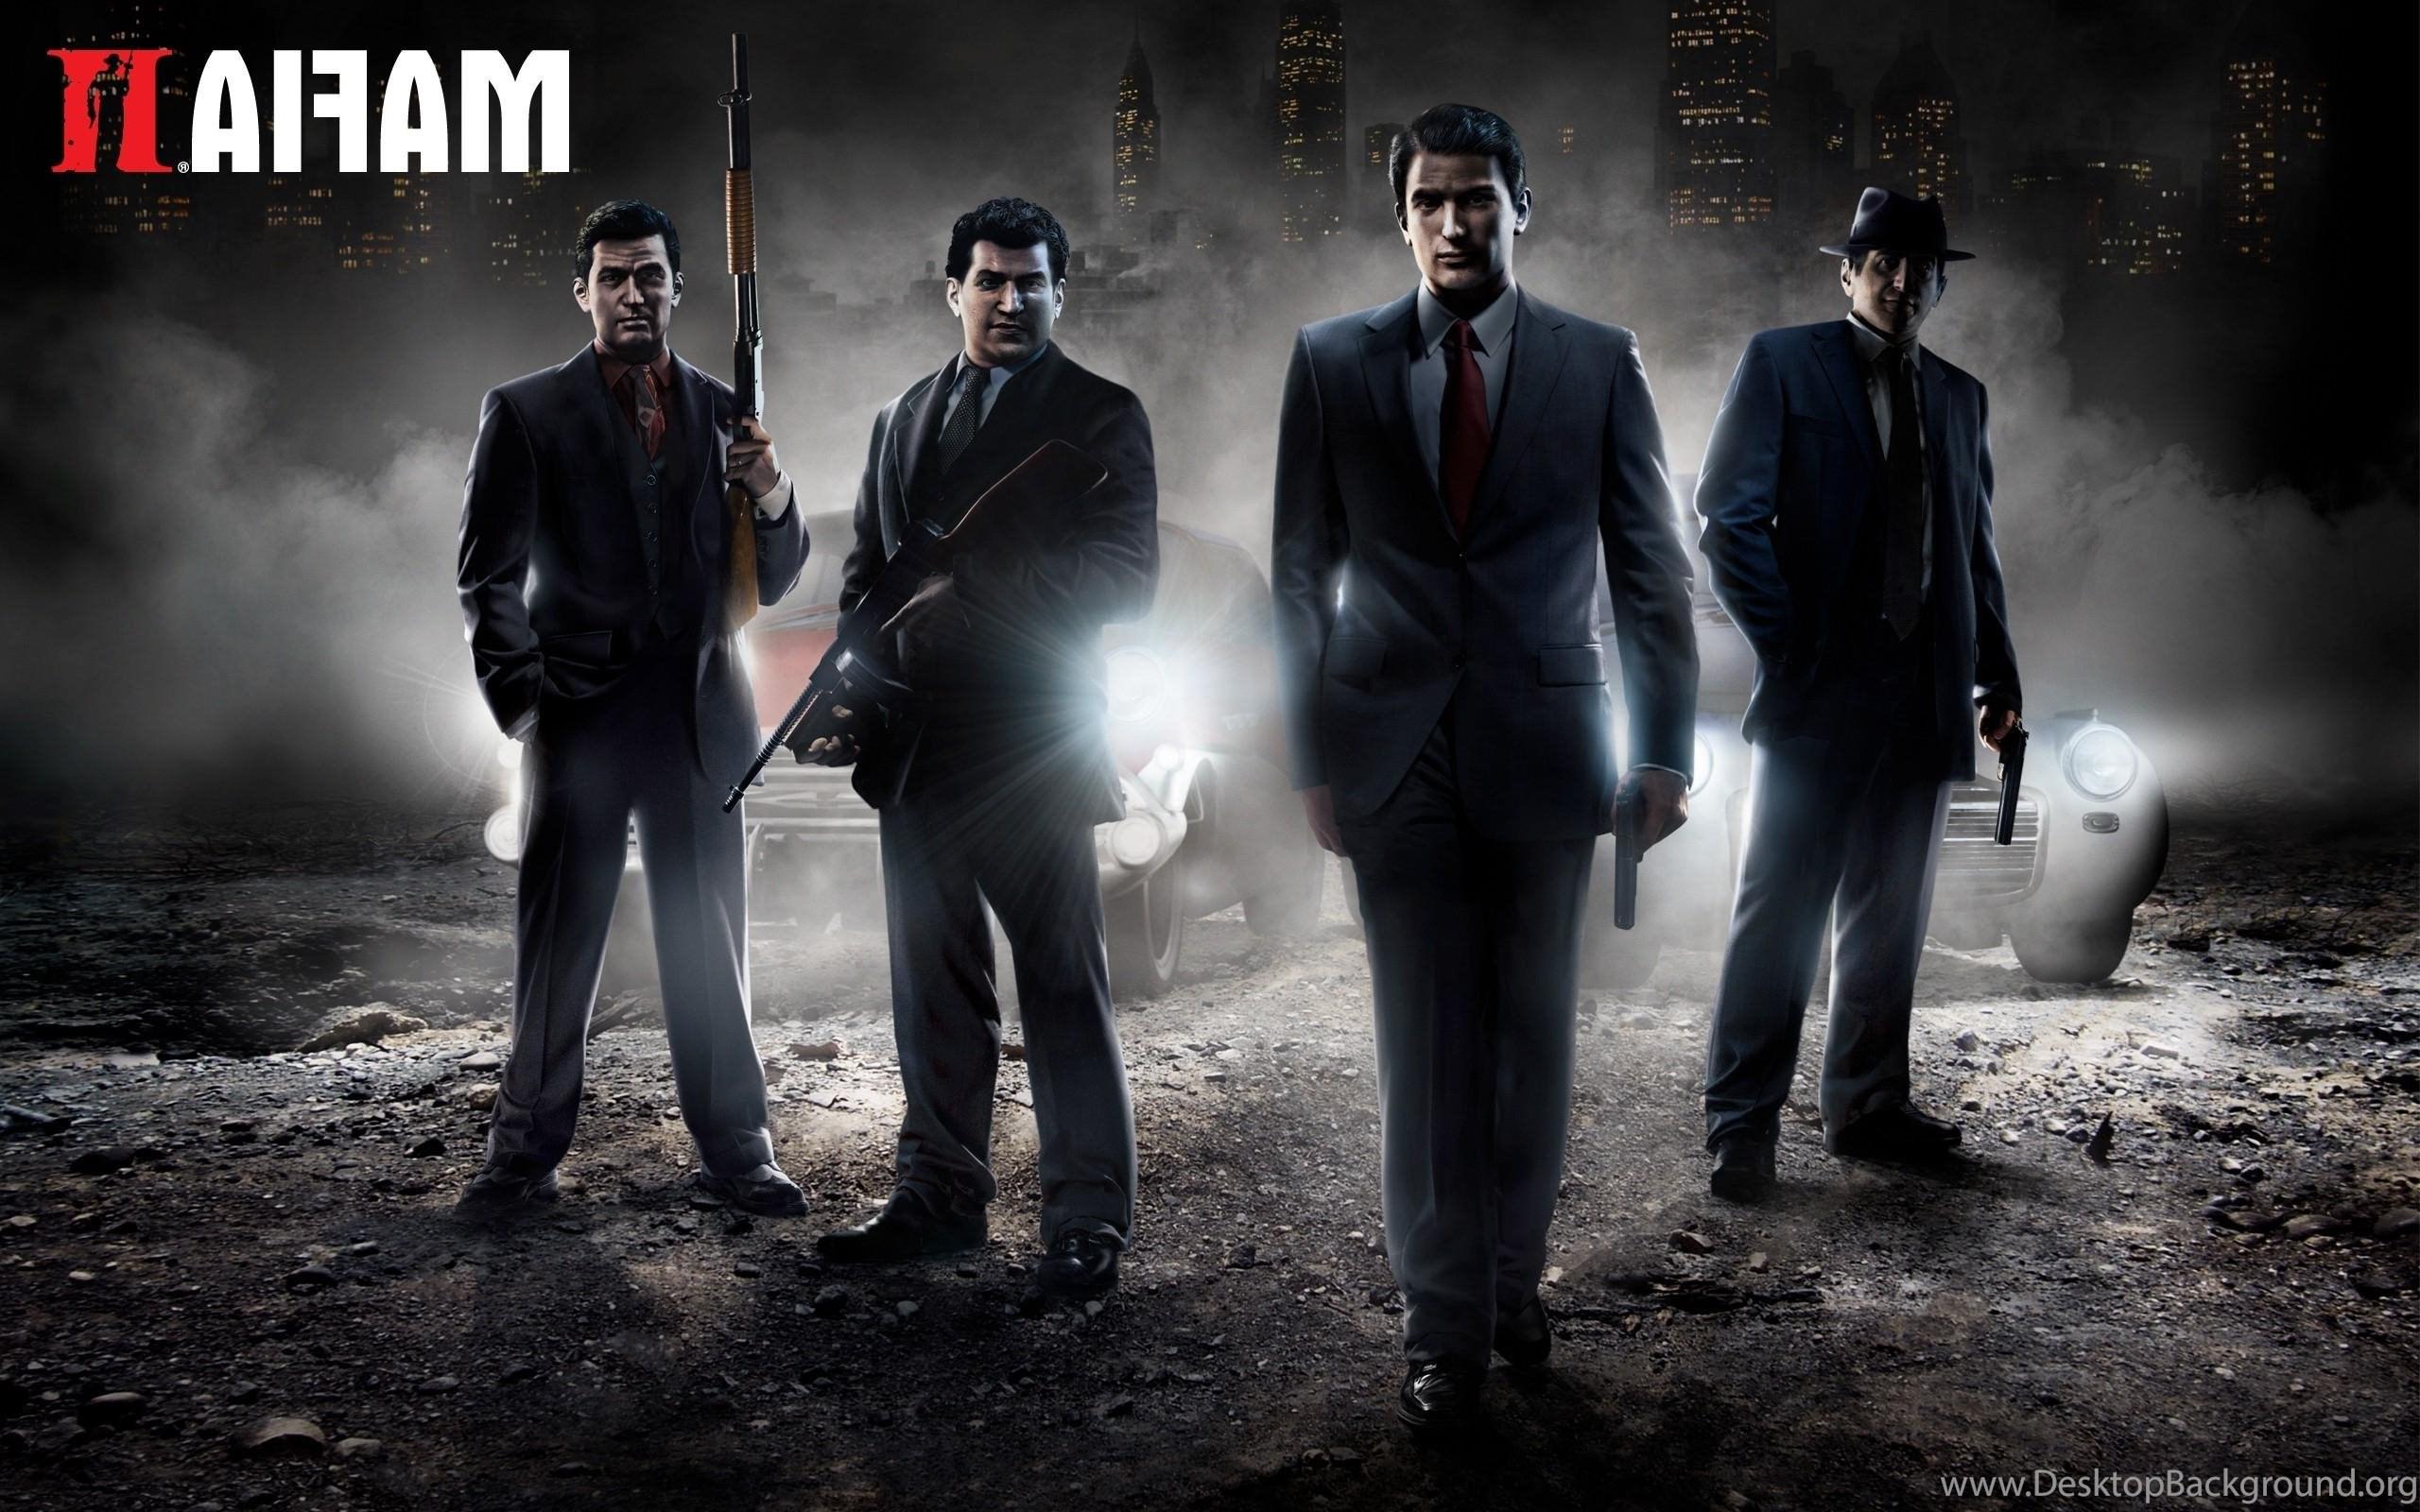 Mafia 2 gun car smoke night hd wallpapers desktop background - How to download mafia 2 ...